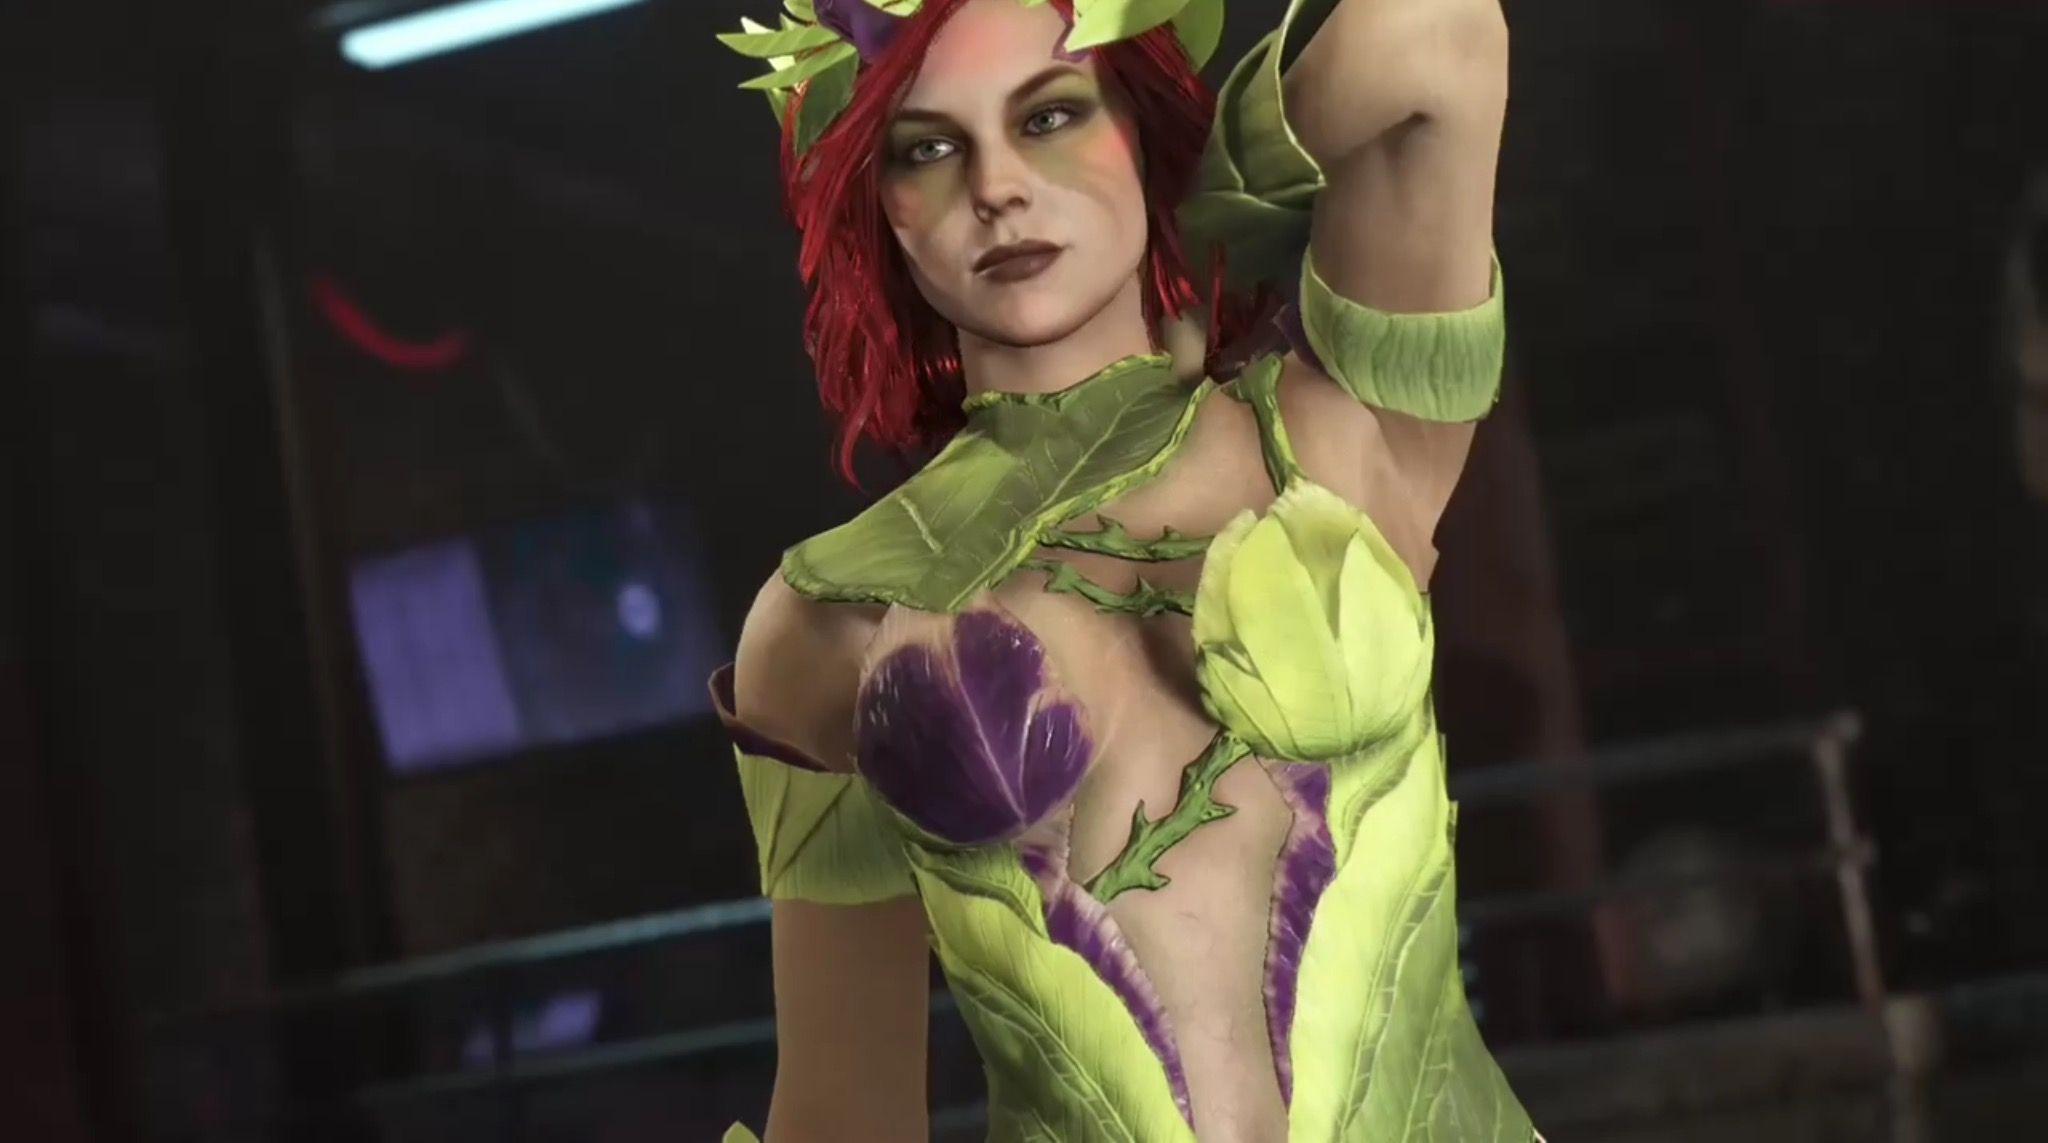 Injustice 2 Poison Ivy Gal Fashion Poison Ivy